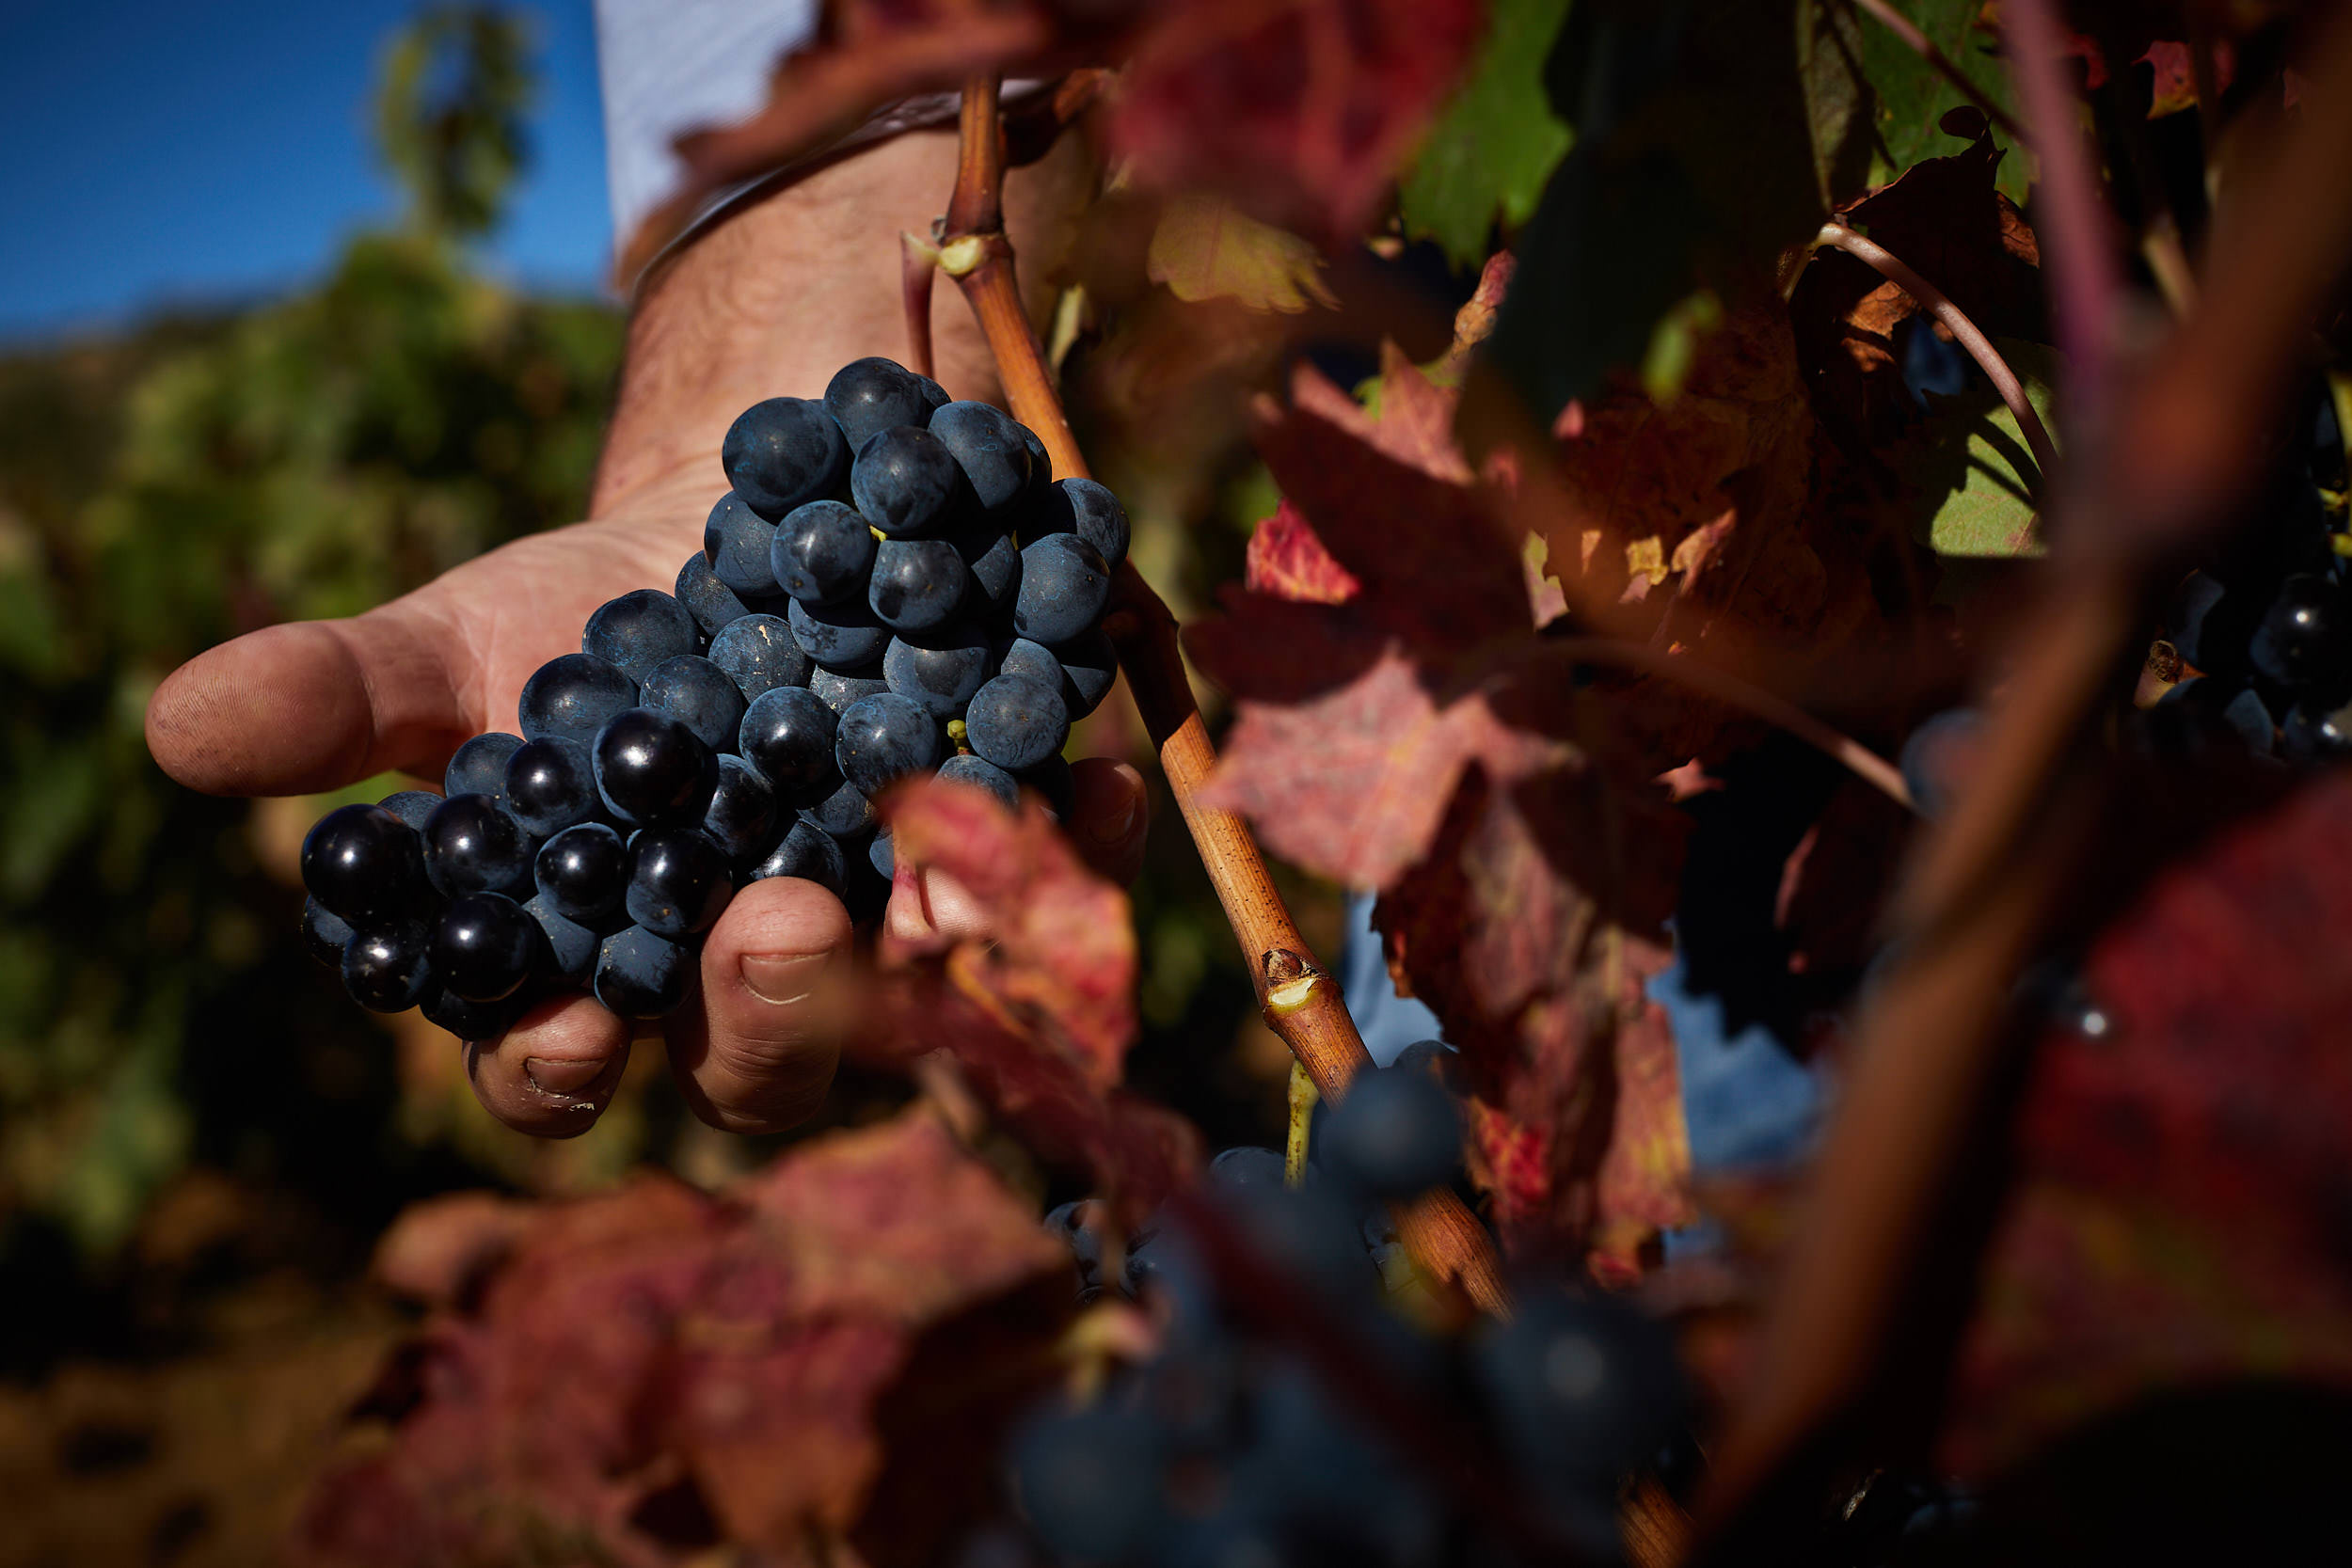 1810Commercial-professional-wine-photography-la-rioja-spain-James-Sturcke_0041.jpg